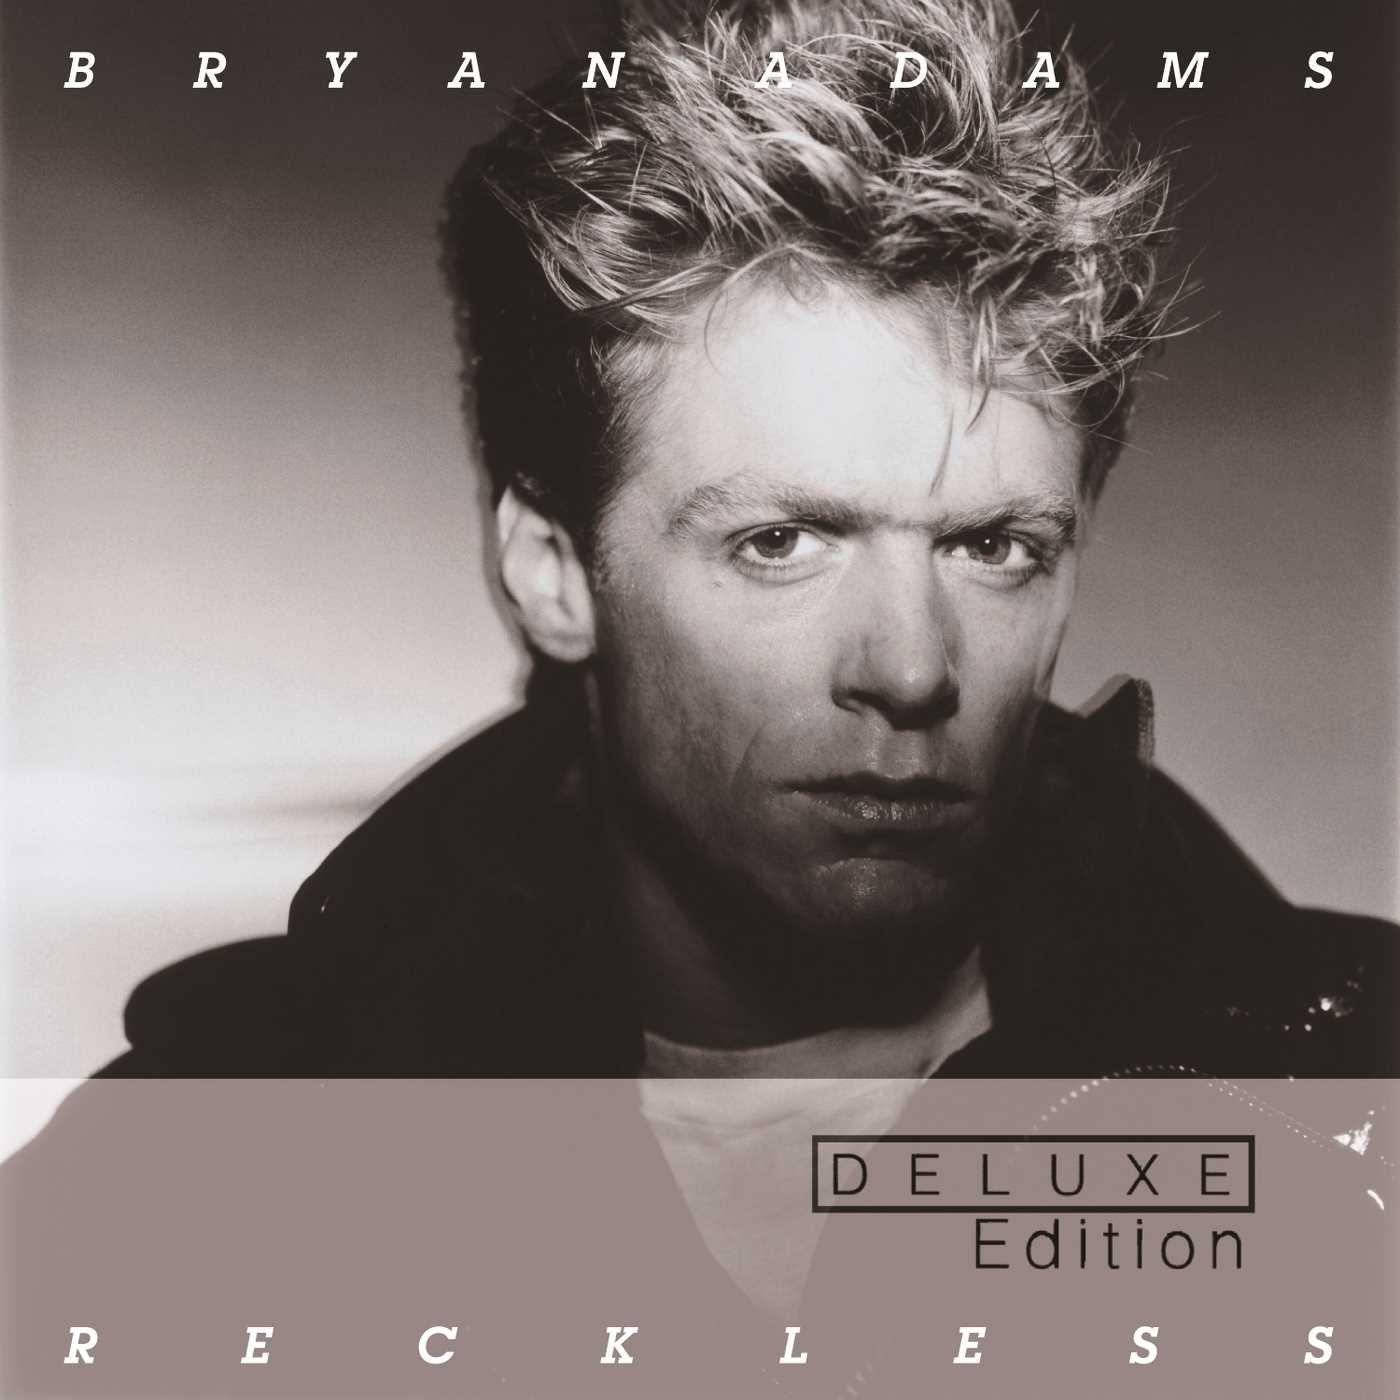 Bryan Adams - CD Reckless (Deluxe Edition)